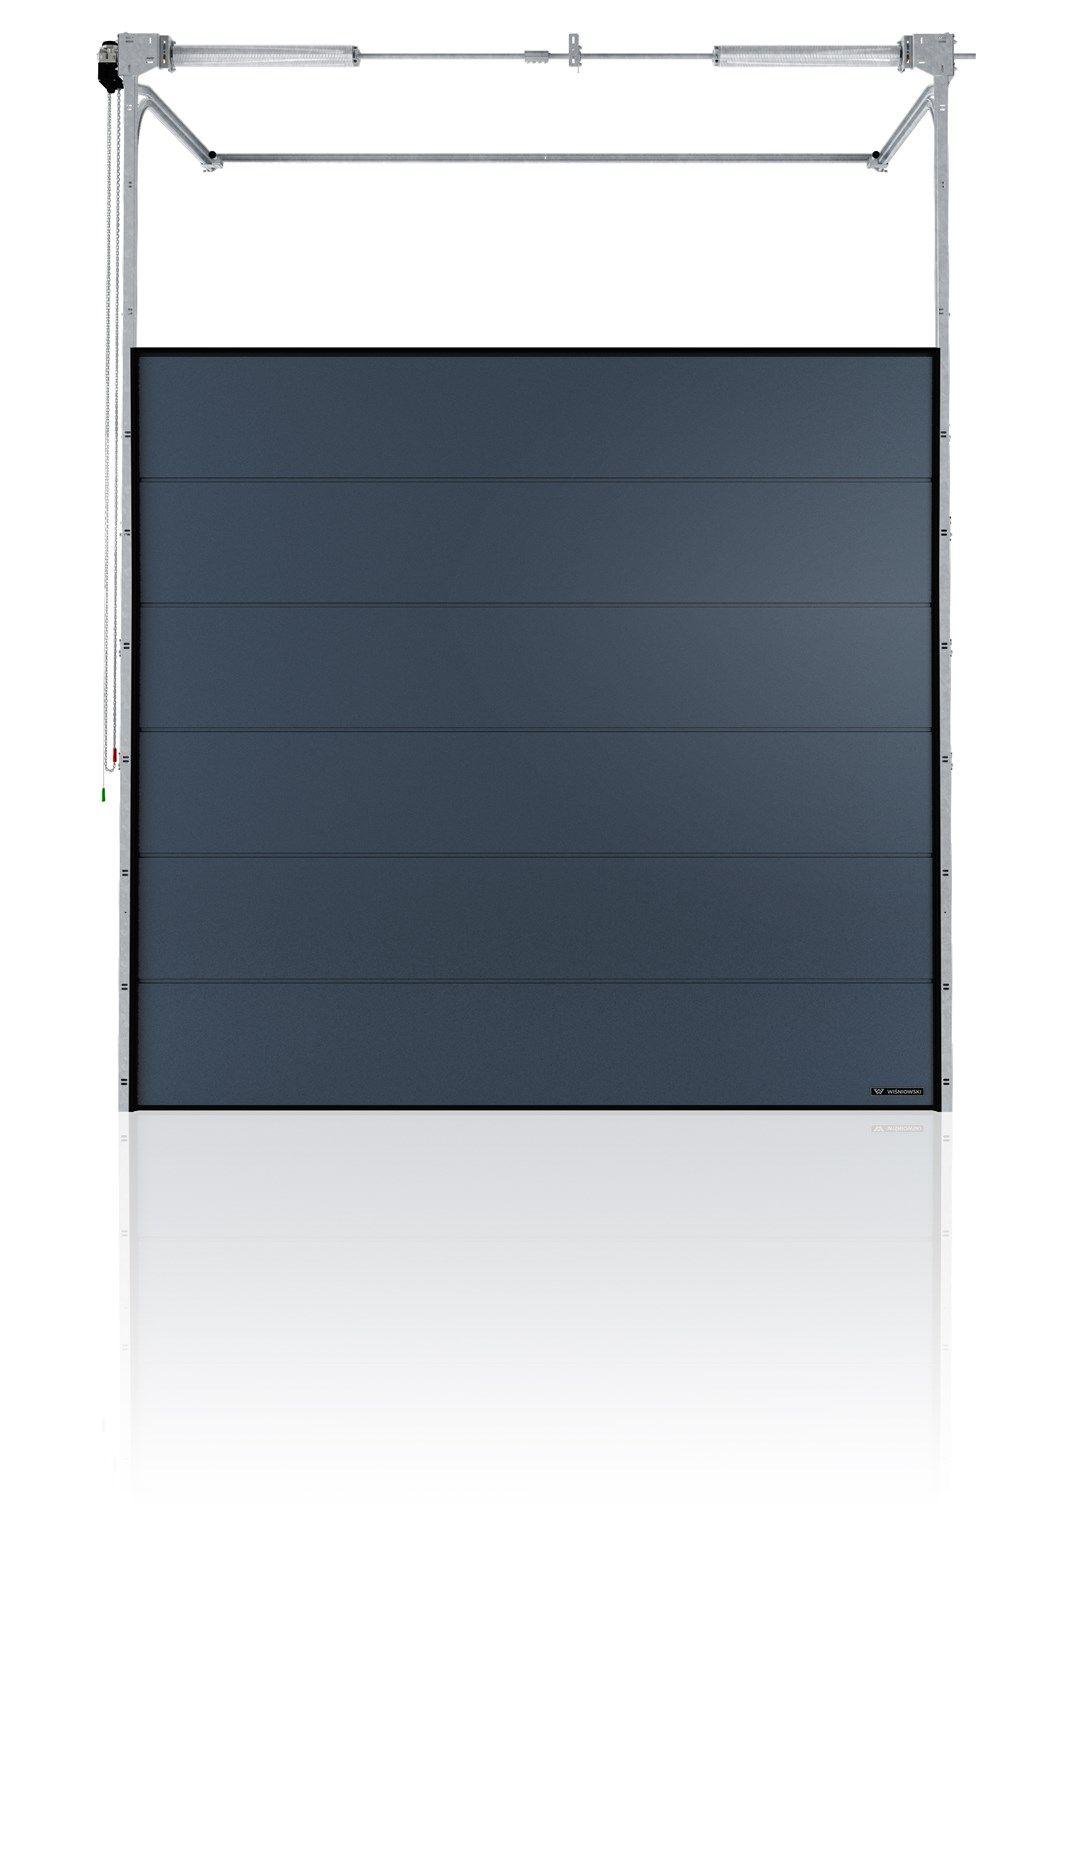 WISNIOWSKI presenta Makro Pro 2.0 e Makro Pro Alu 2.0